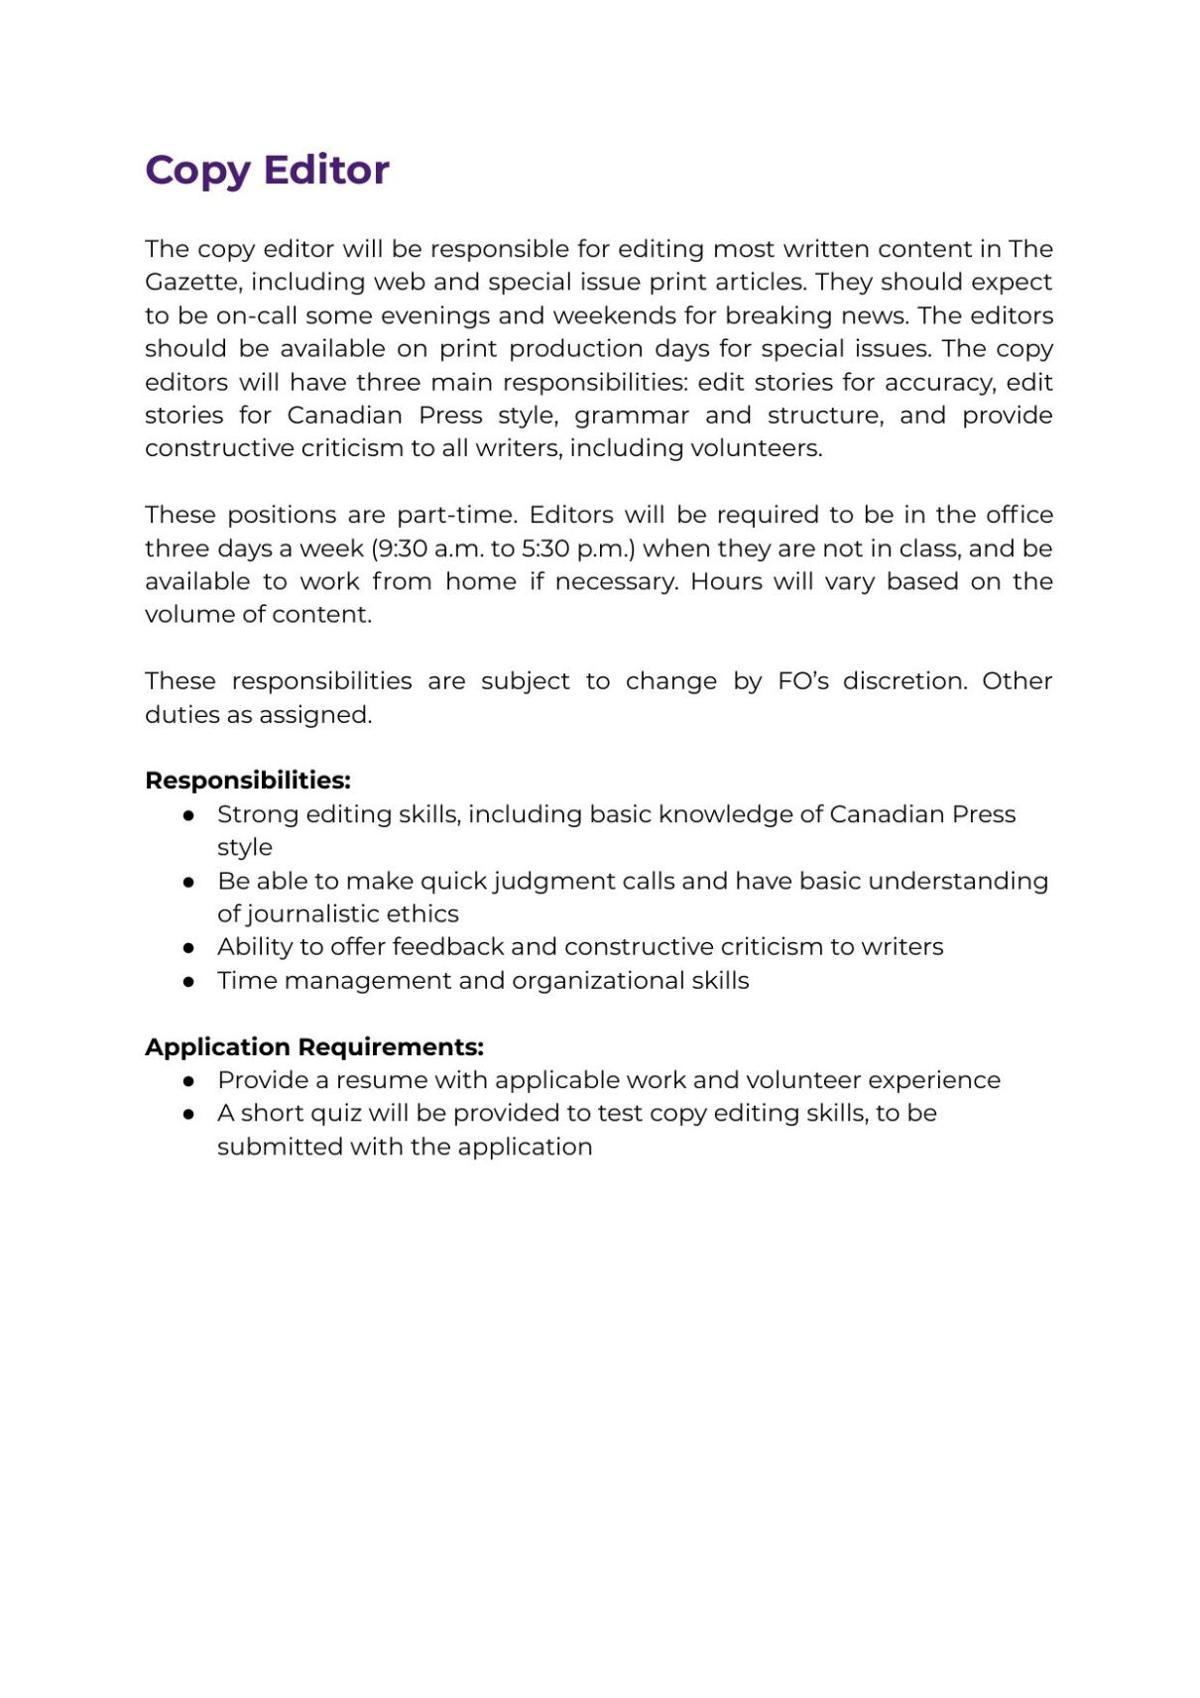 Copy Editor Job Description 2021